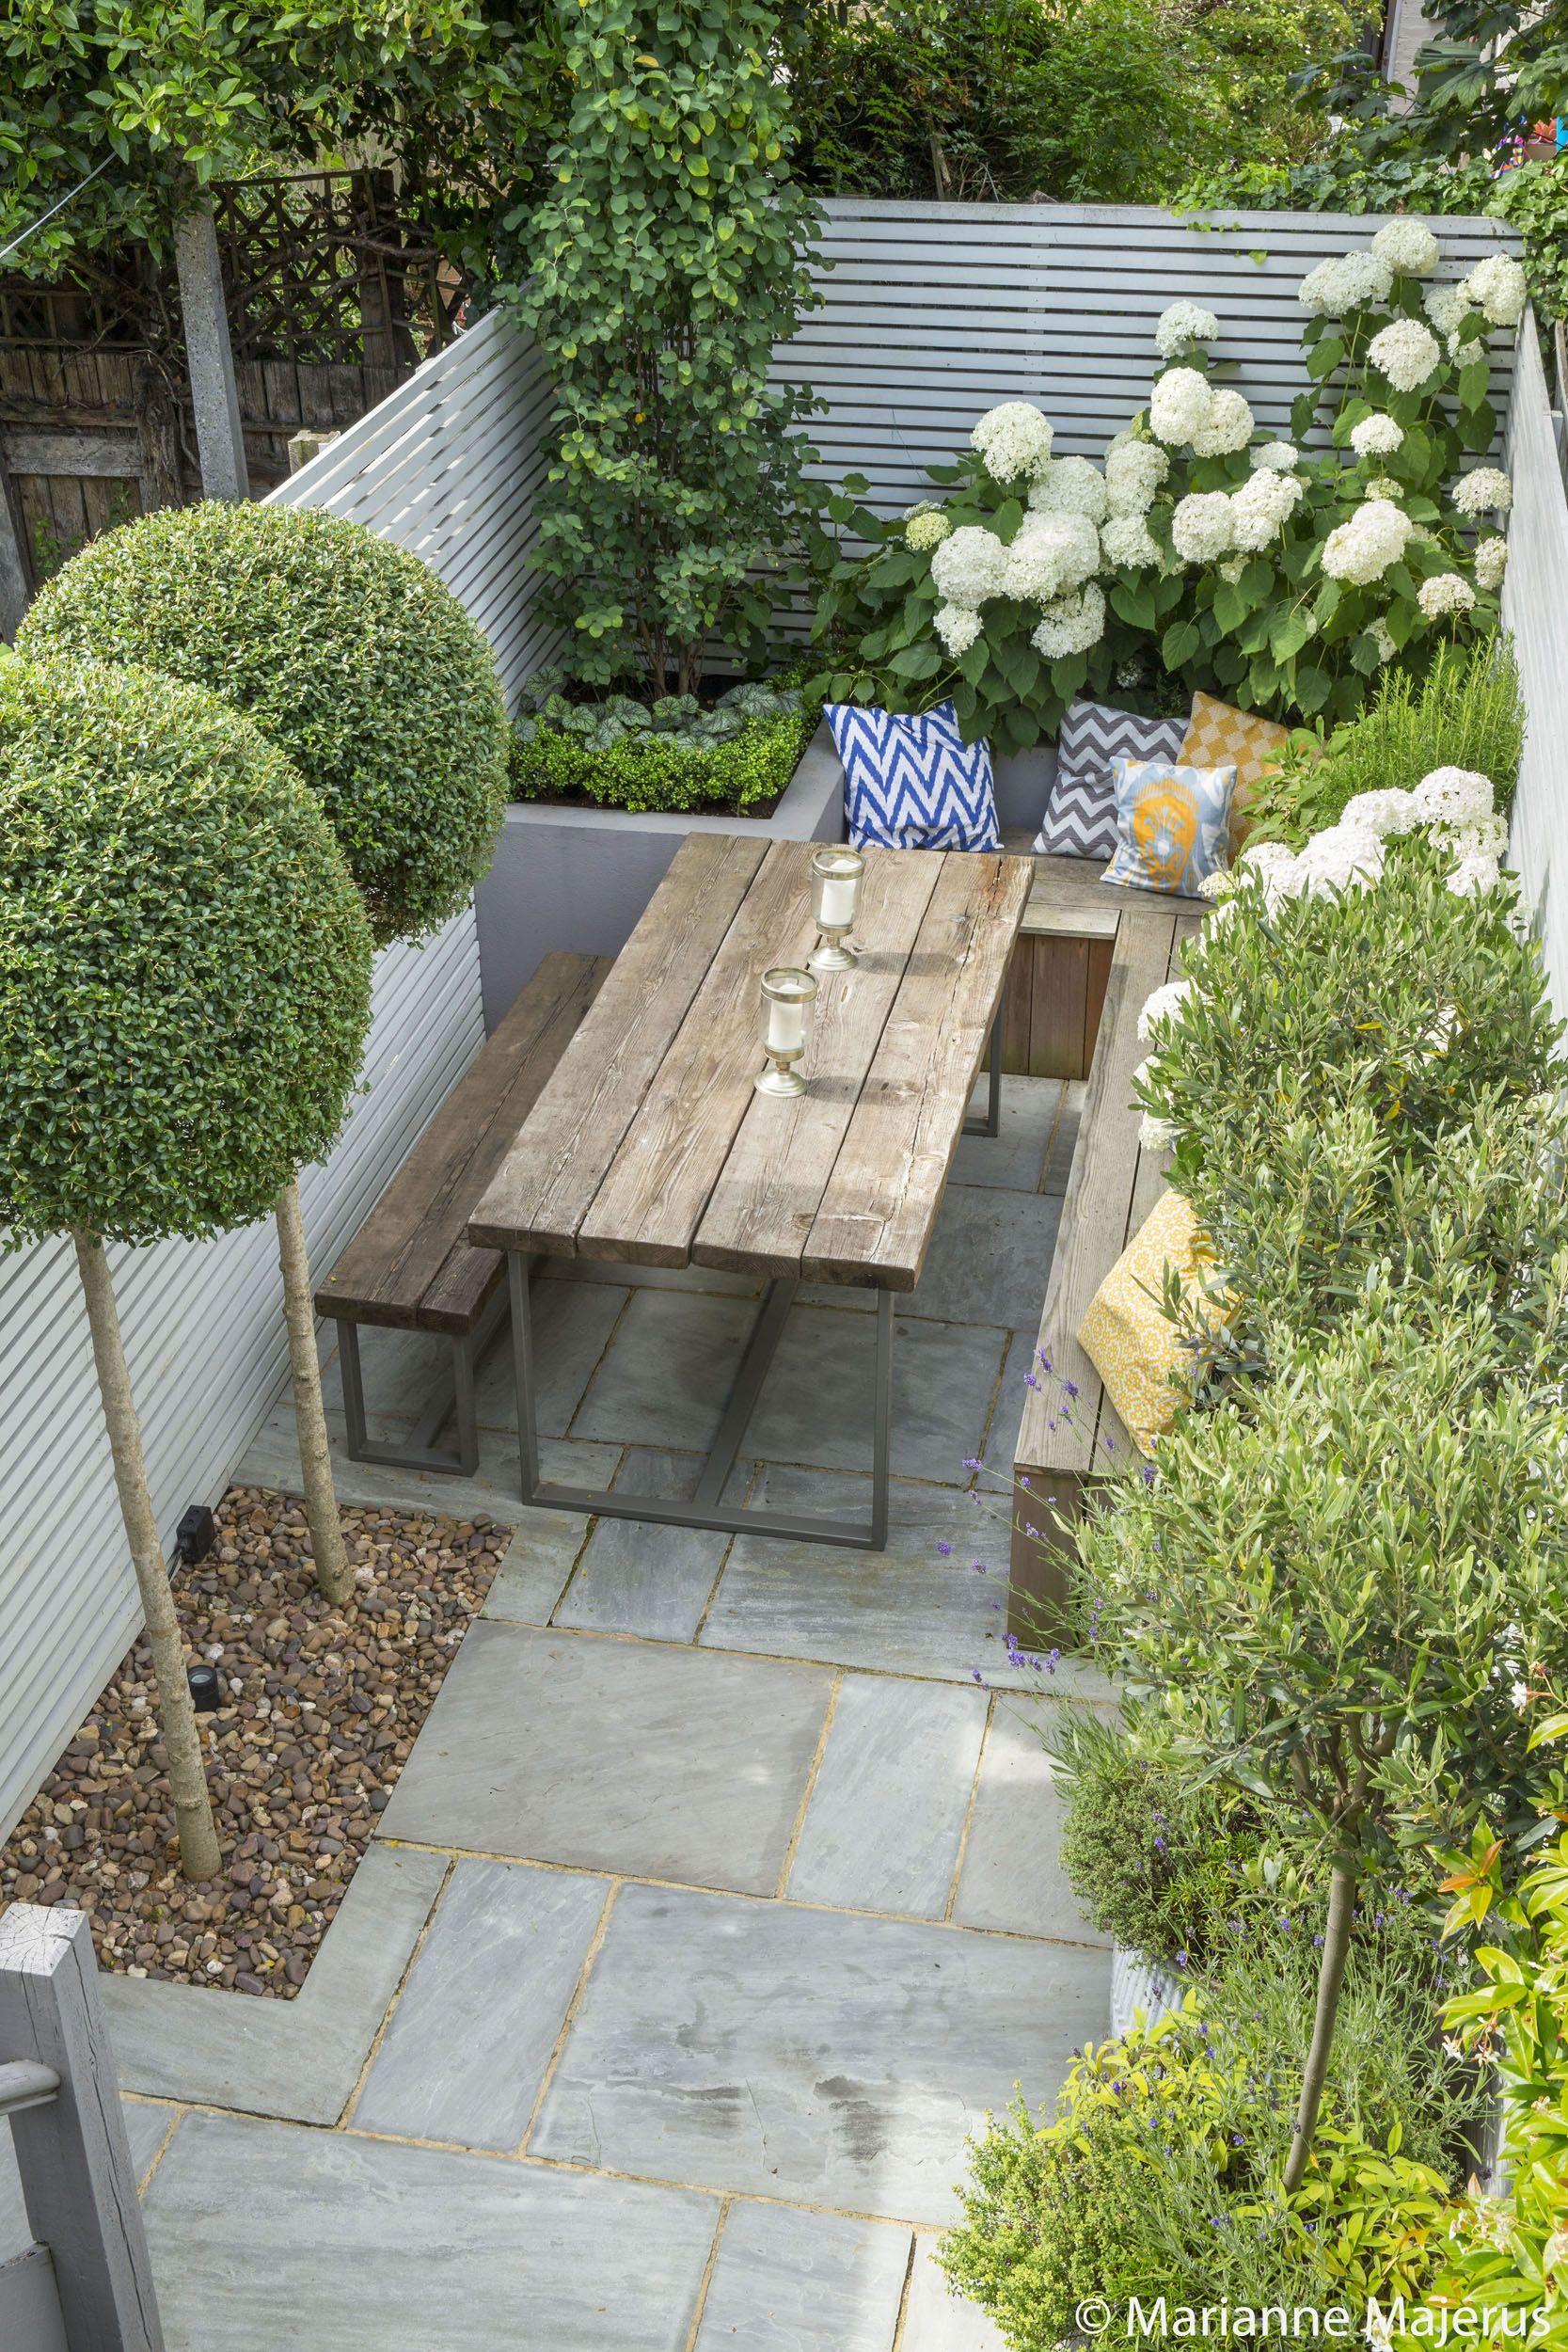 Fulham Lontoon Puutarhaklubi In 2020 Courtyard Gardens Design Garden Design London Small Backyard Landscaping